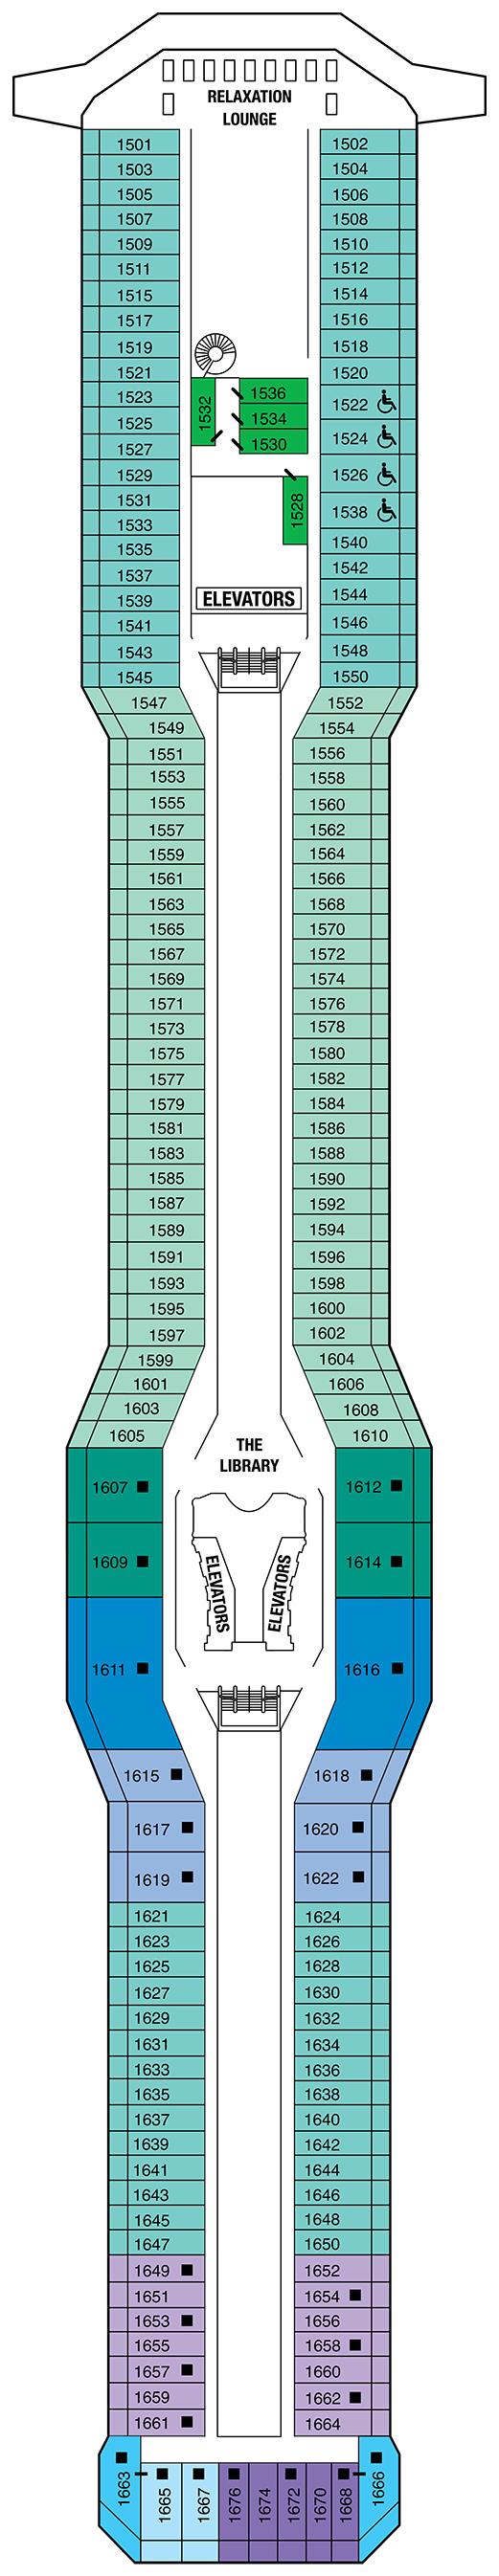 Cruise Ship Deck Plans | CruiseMapper